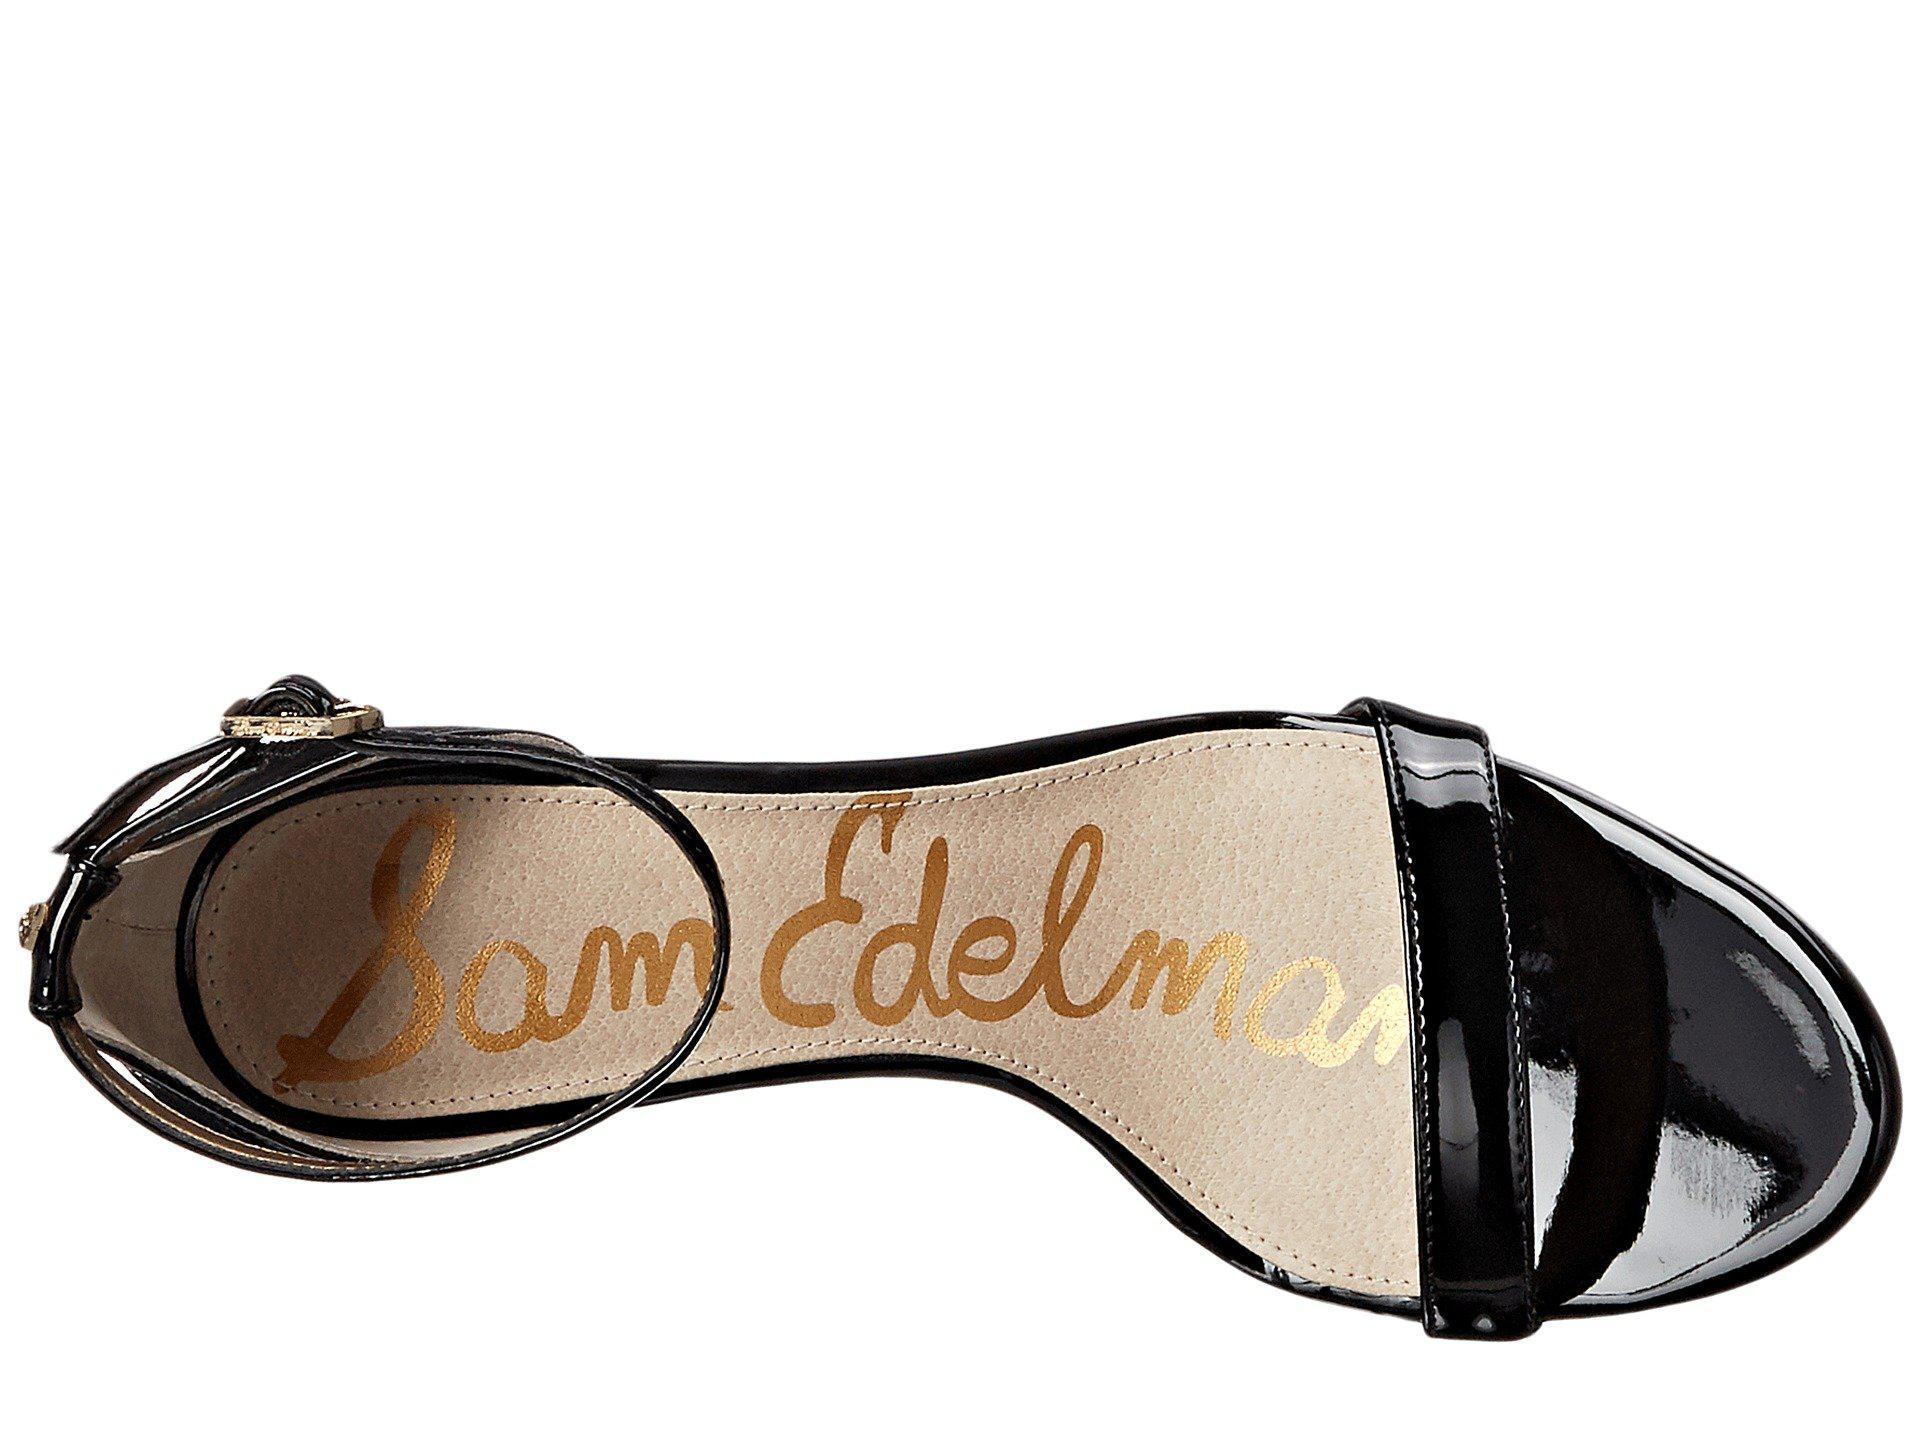 af71818e7c59 Sam Edelman - Black Patti Strappy Sandal Heel (light Gold Leather) High  Heels -. View fullscreen